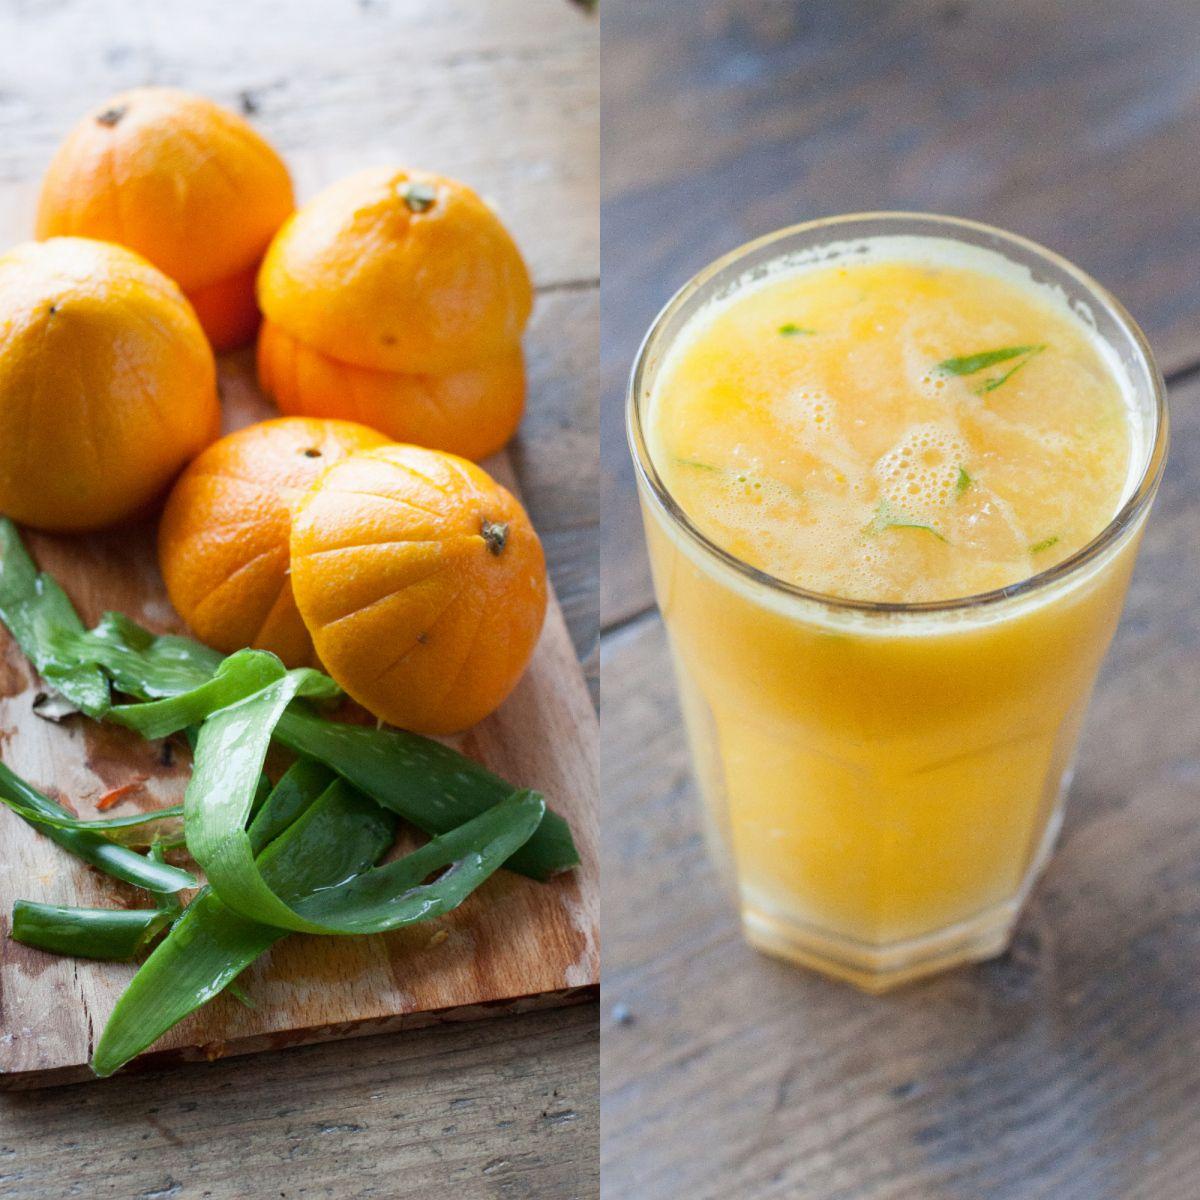 Aloe vera orange juice very good detoxer and source of